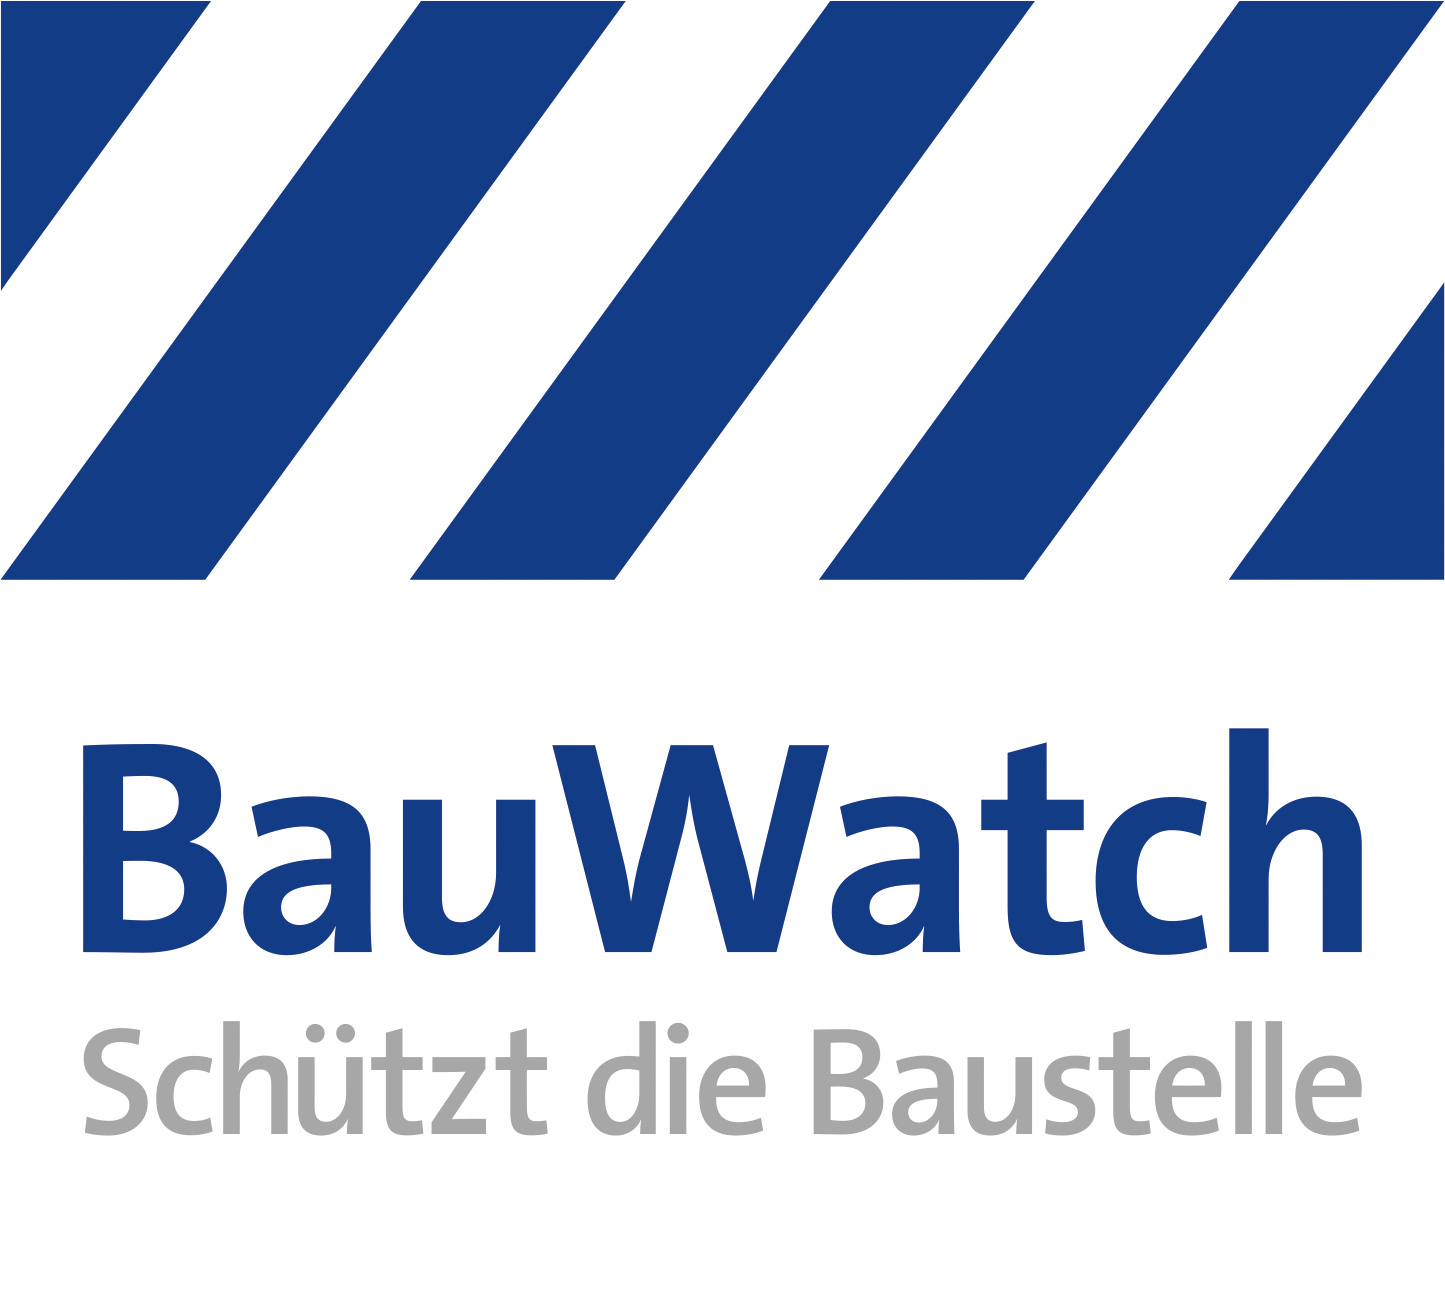 bauwatch logo